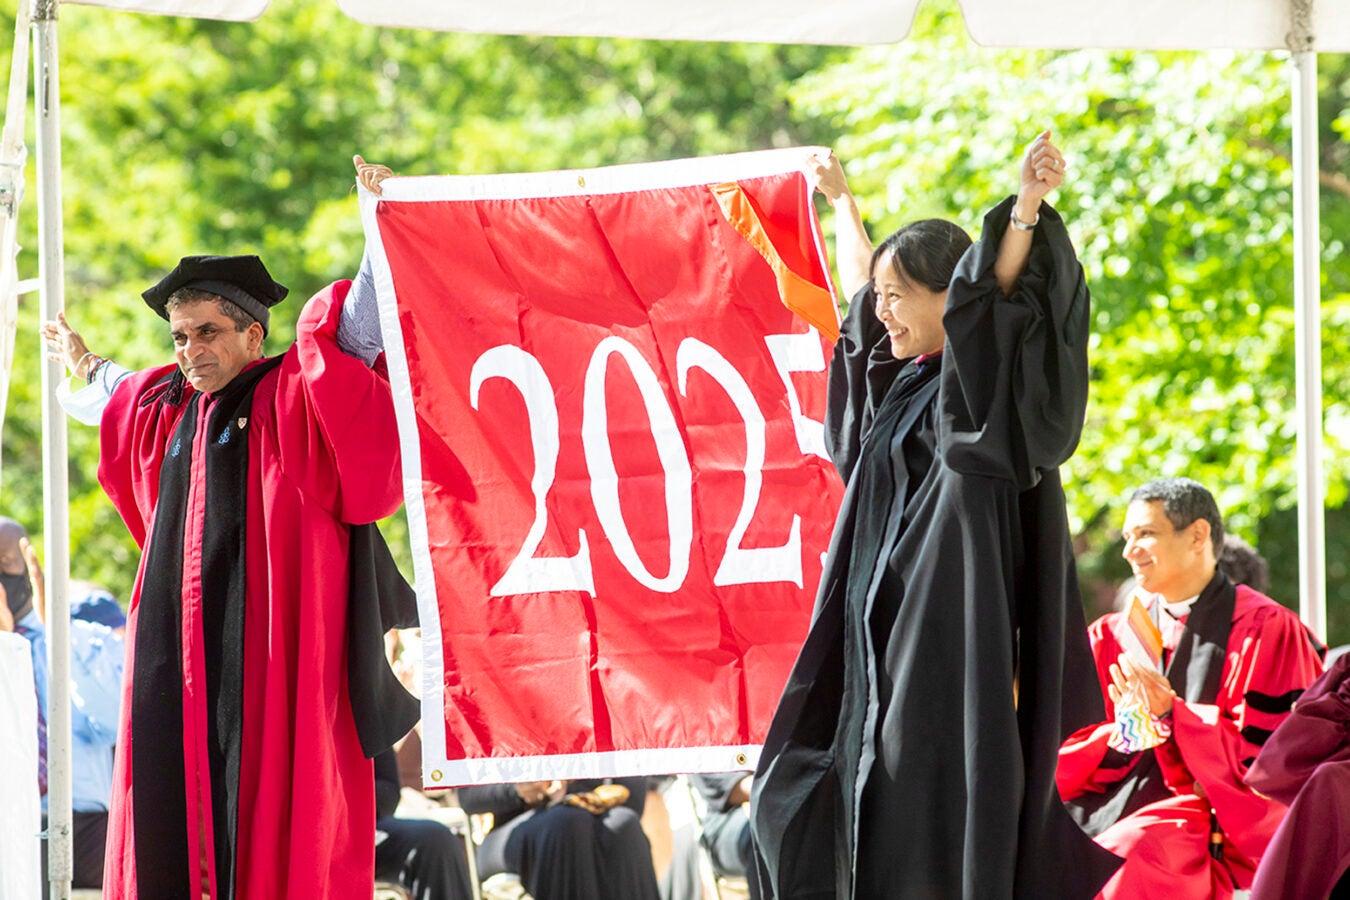 Danoff Dean of Harvard College Rakesh Khurana (left) and Vanessa Liu, president of theHarvard Alumni Association, give the Class of 2025 an enthusiastic welcome.